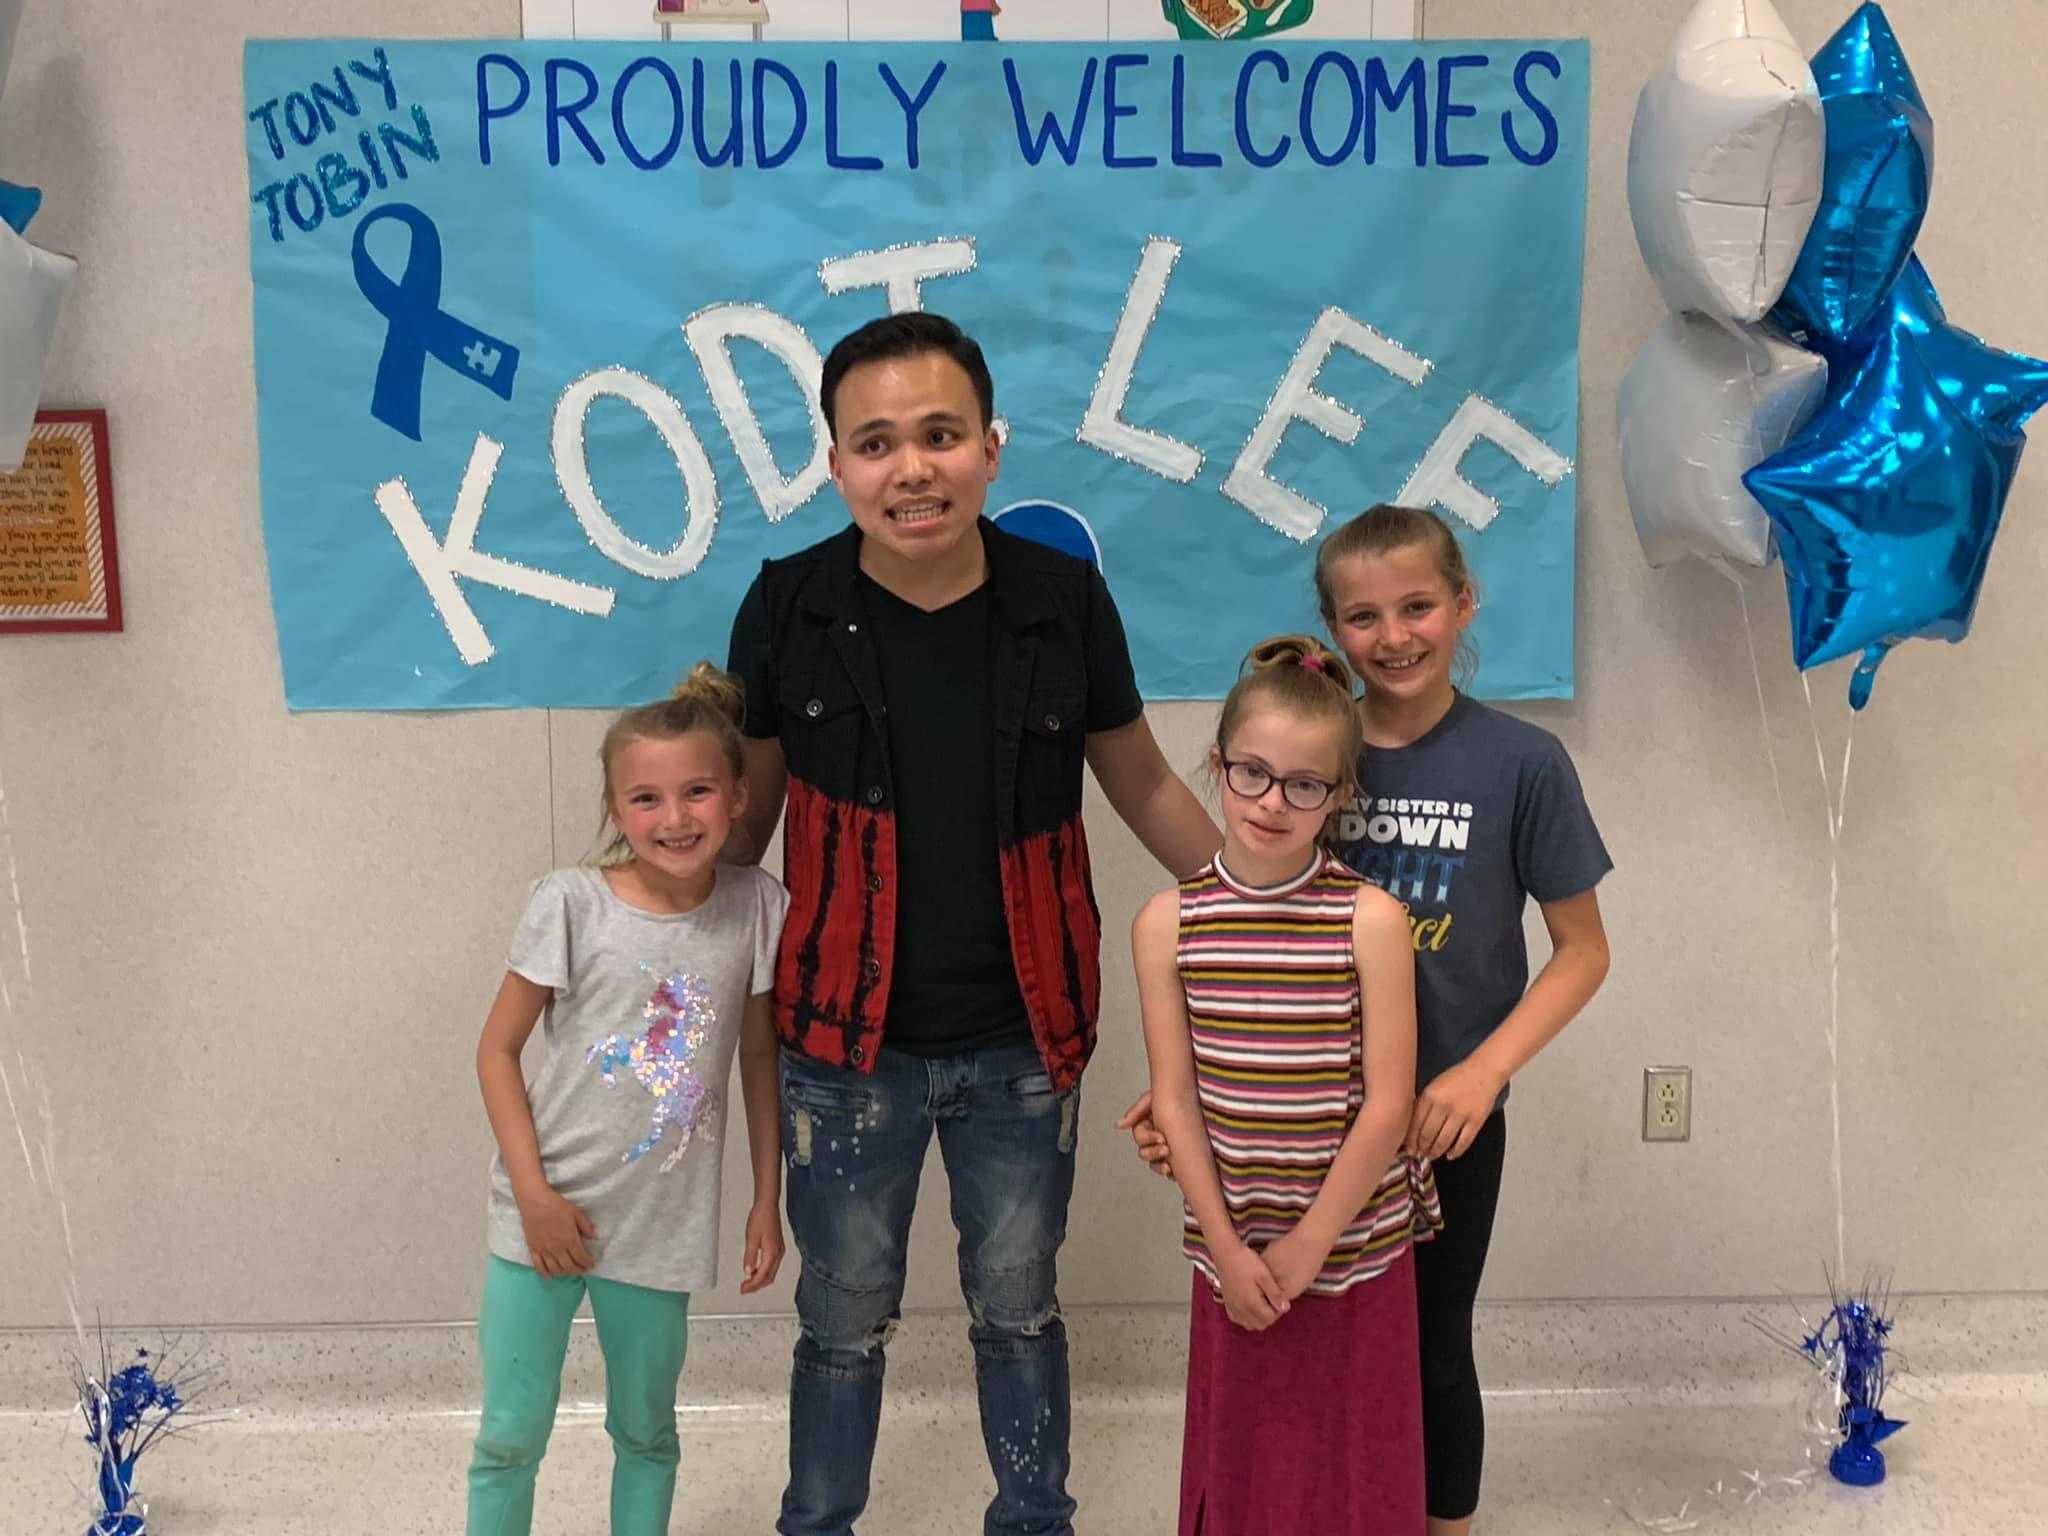 Kodi Lee photographed at Tony Tobin Elementary School